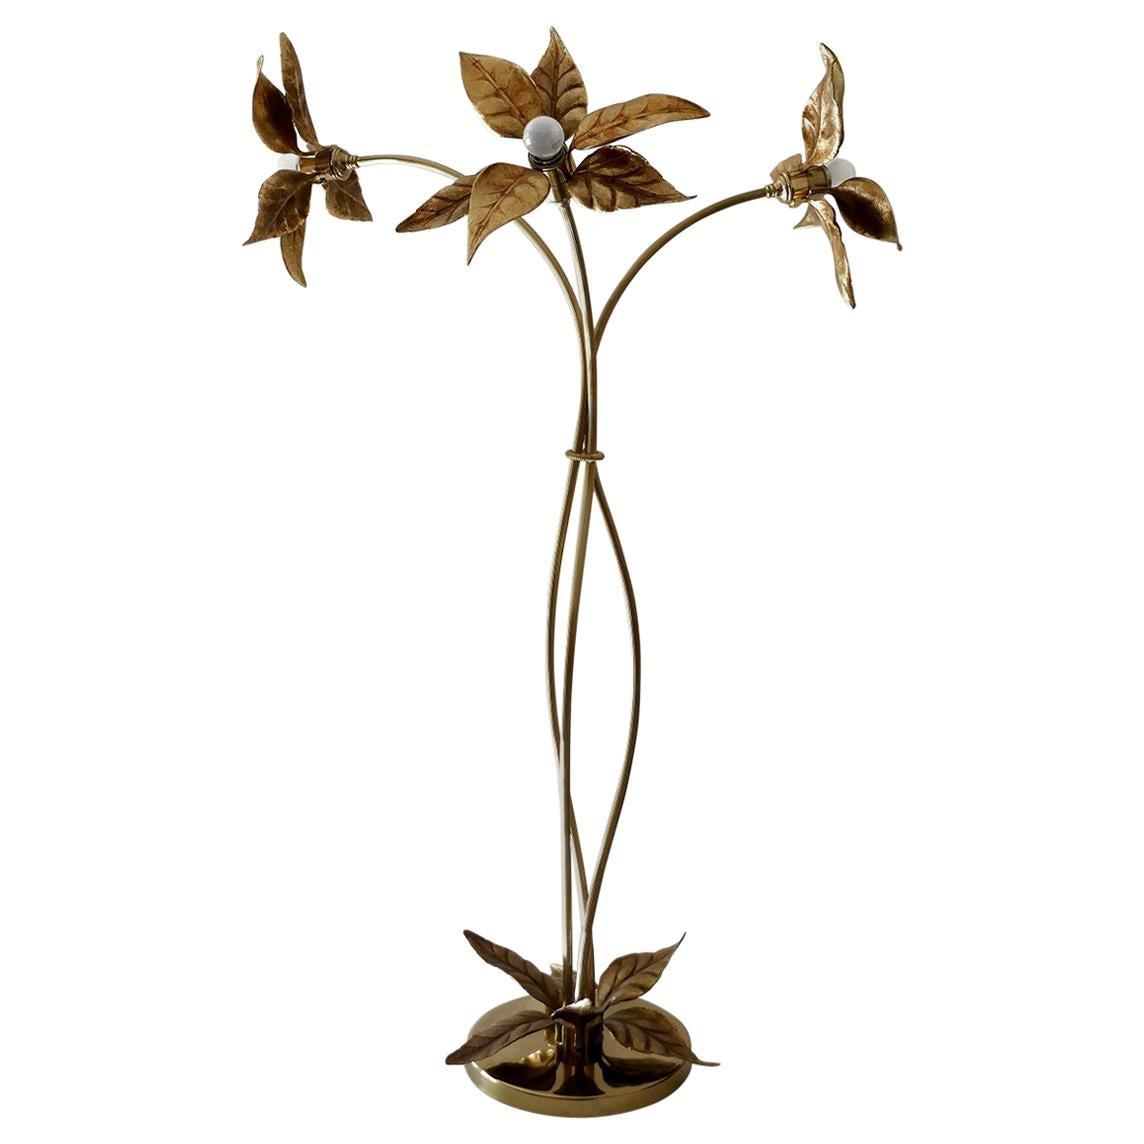 Large Sculptural Organic Brass and Gilt Metal Flower Leaf Floor Light, 1960s